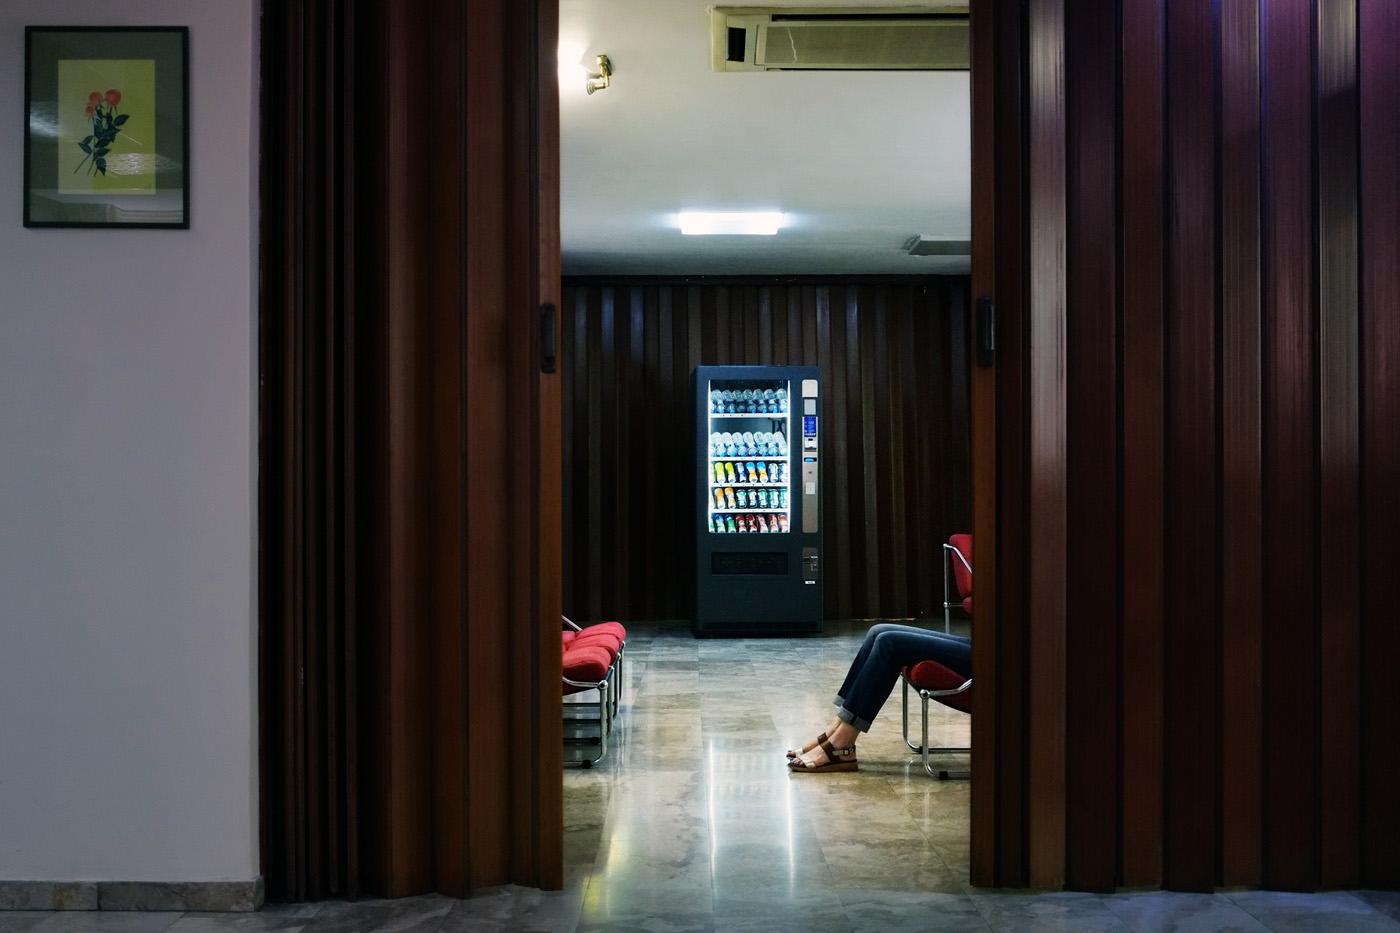 John Sigma_Greece_HotelEuropa_09.jpg.jpg